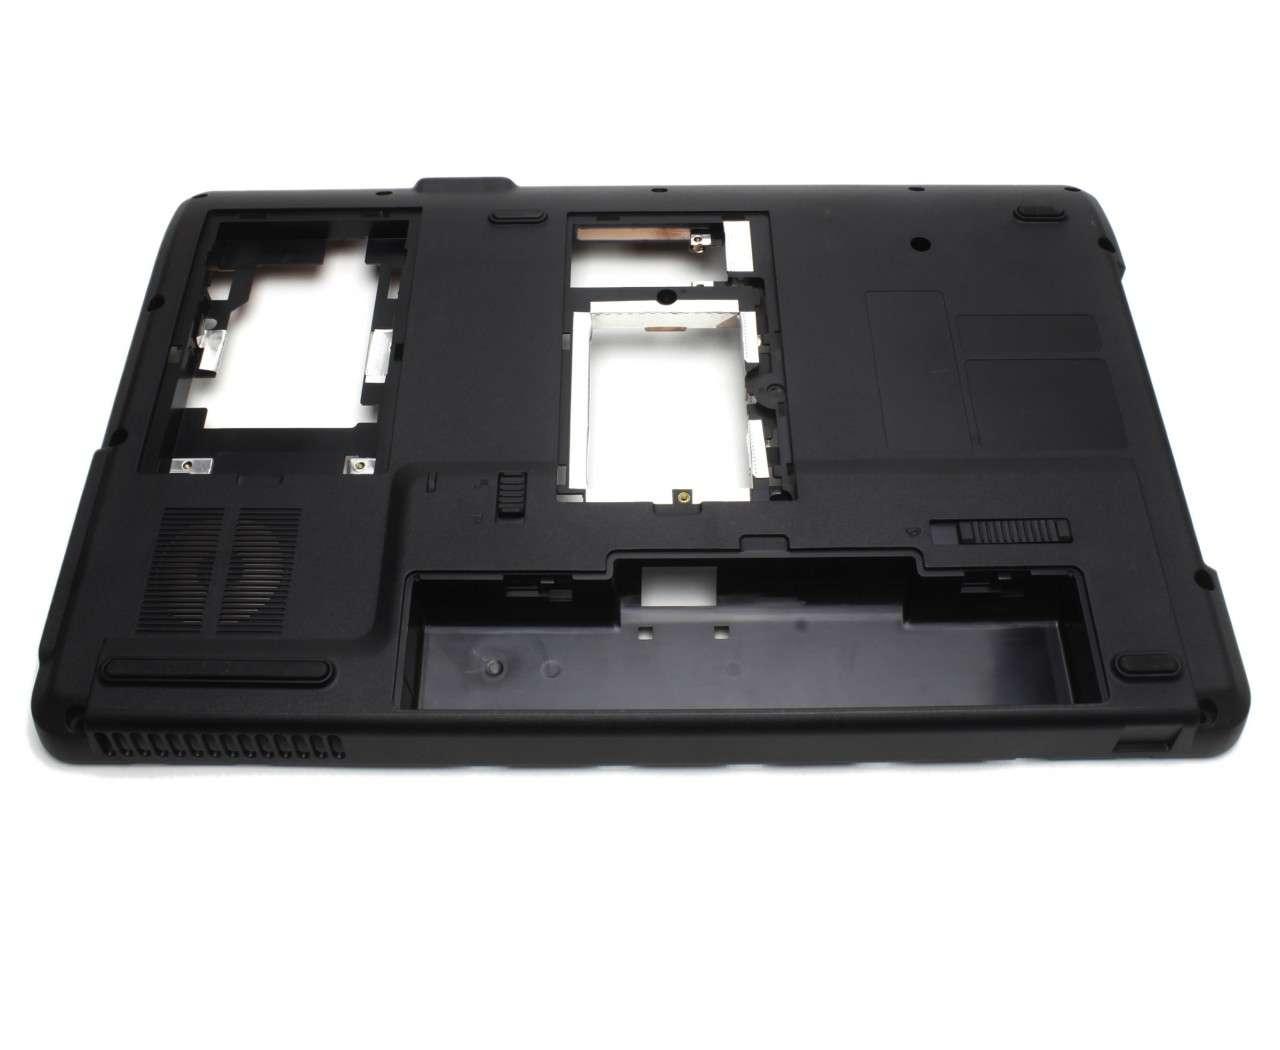 Bottom Case Emachines E625 Carcasa Inferioara Neagra imagine powerlaptop.ro 2021